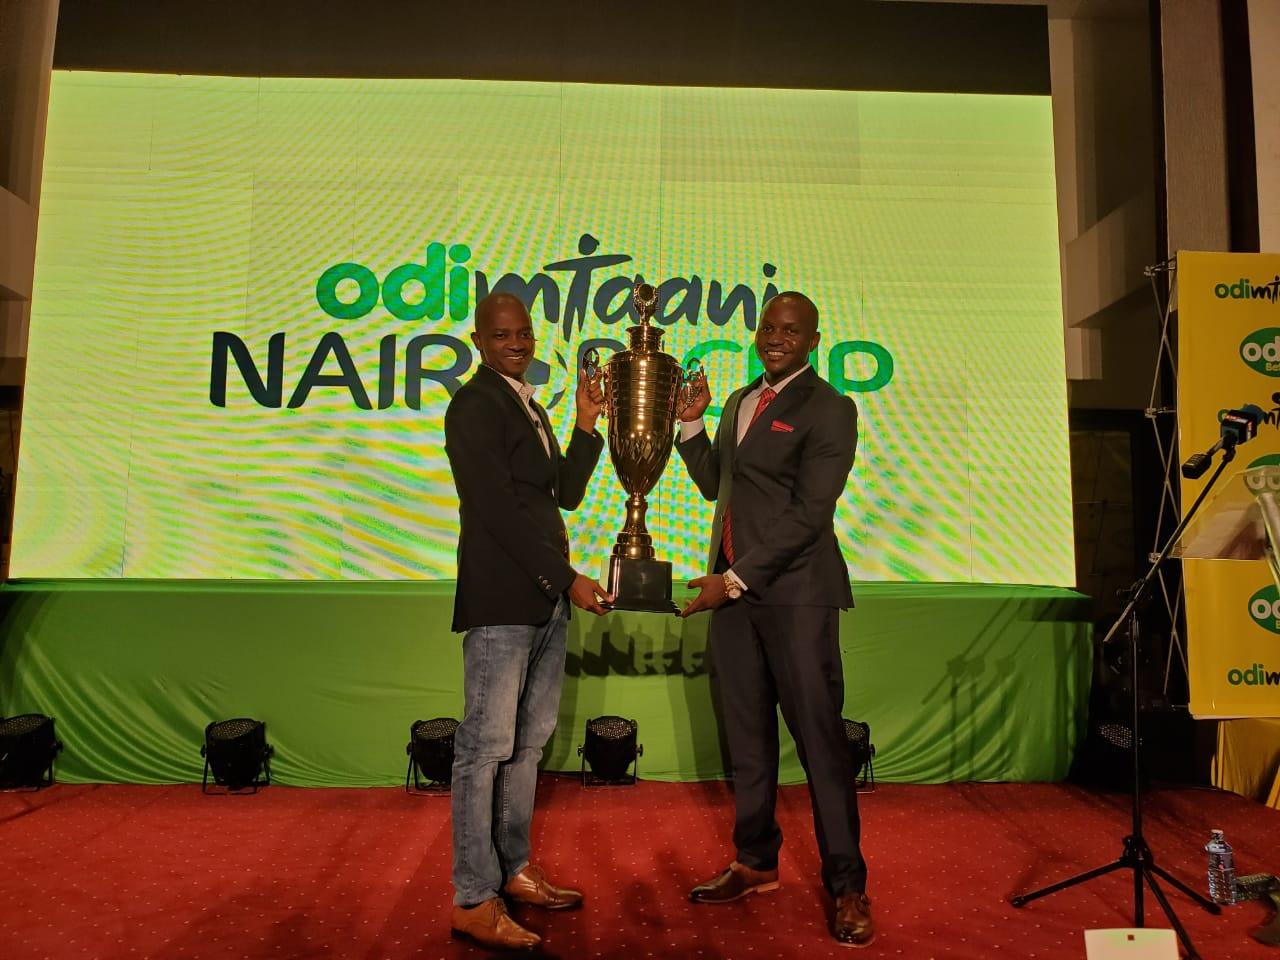 FKF President Nick Mwendwa (left) with Odibets country manager Aggrey Sayi showcase the Odi Mtaani cup. www,businesstoday.co.ke